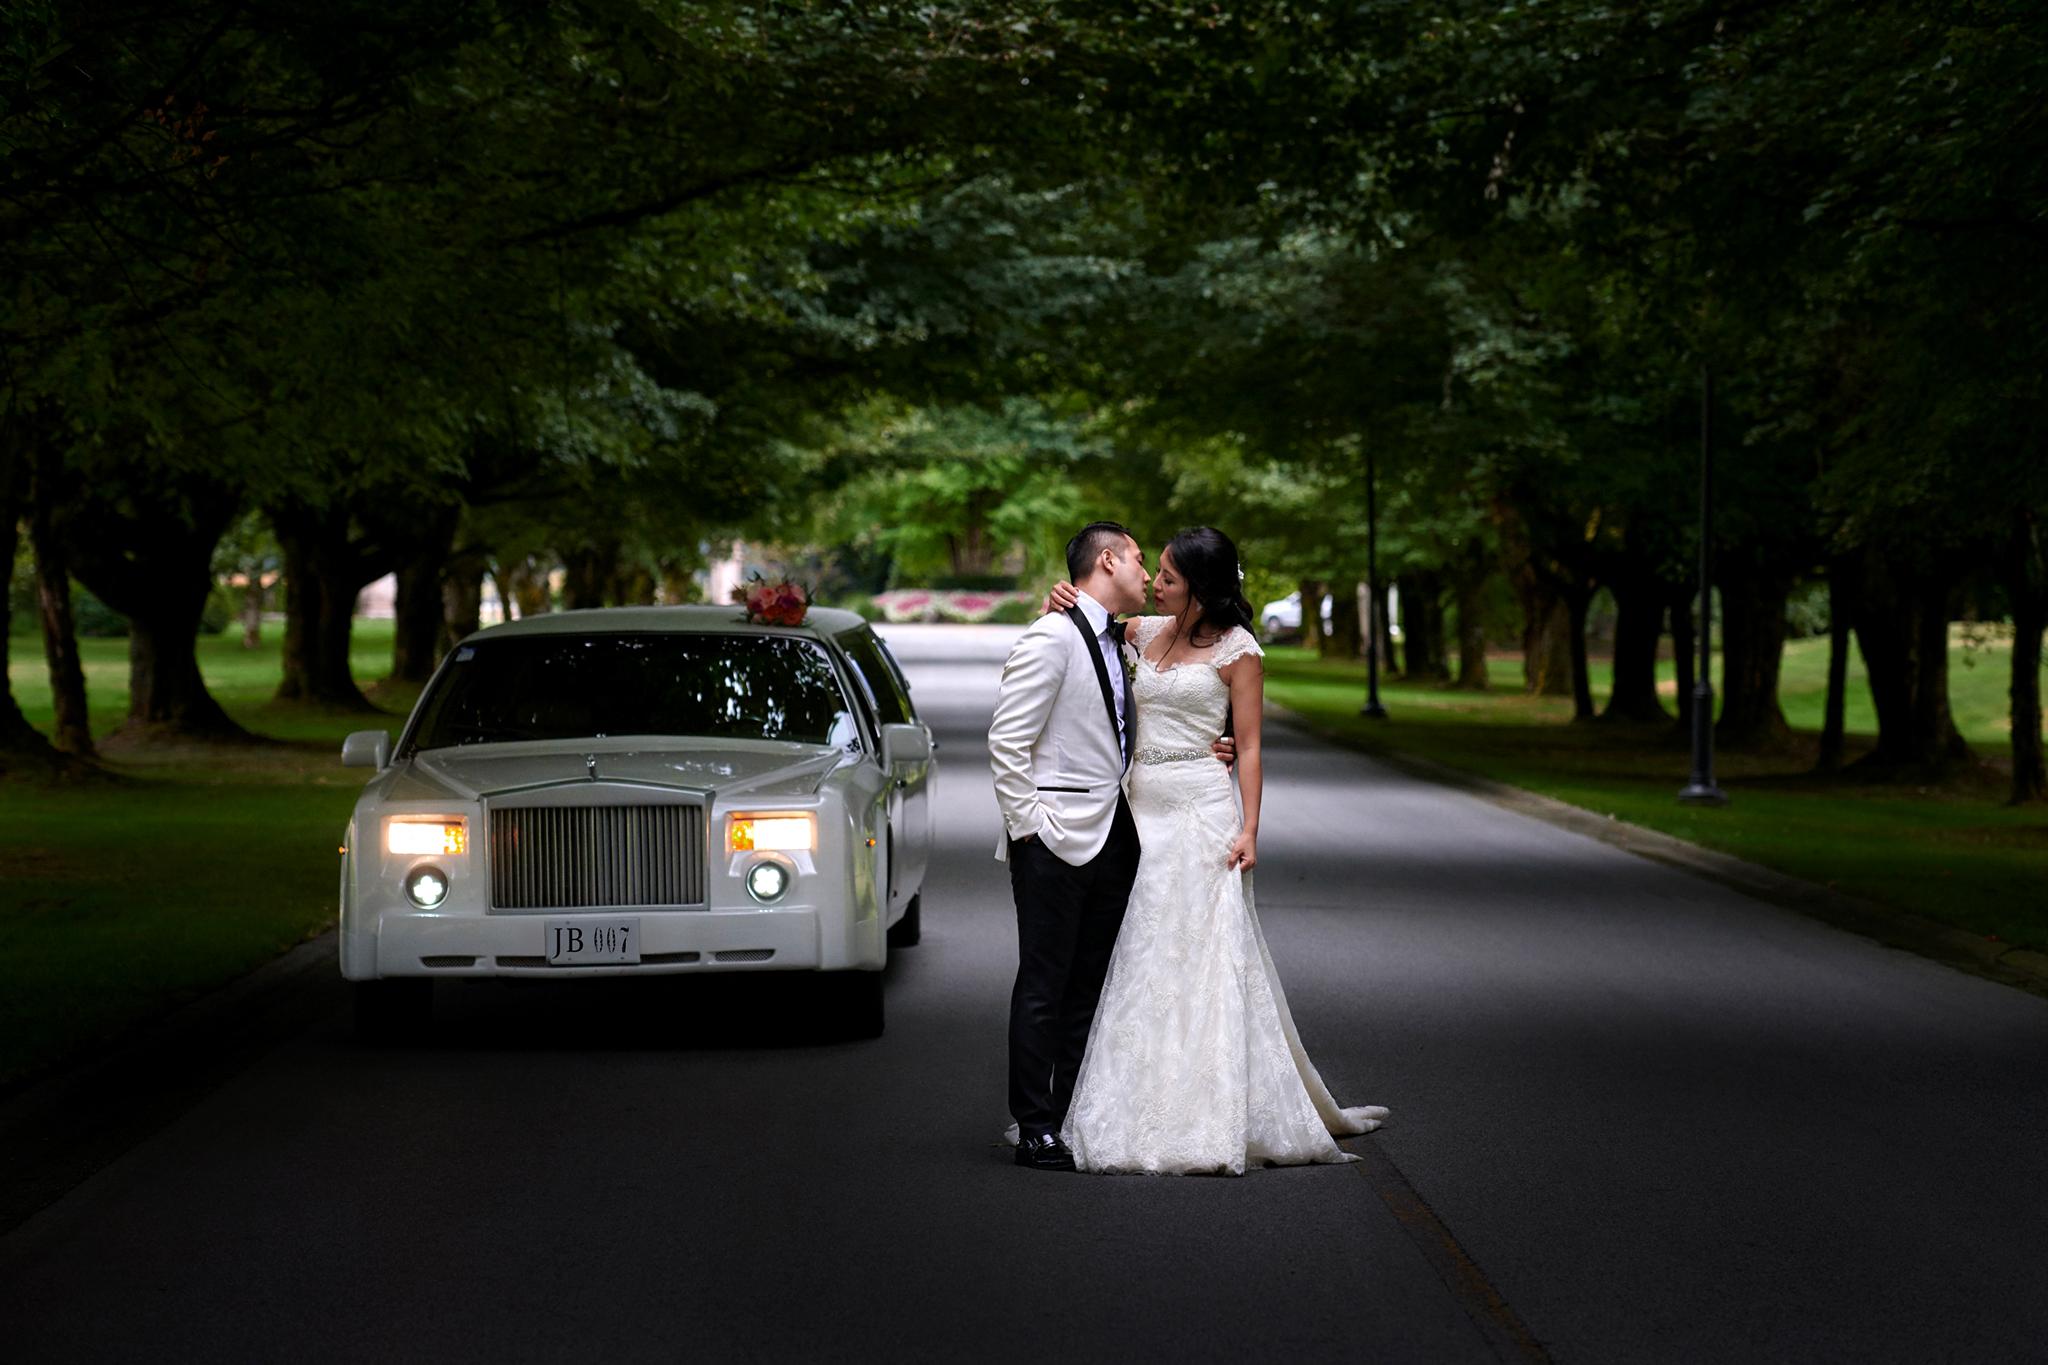 Vancouver wedding at Swaneset Bay Resort, Robert Demeter Photography